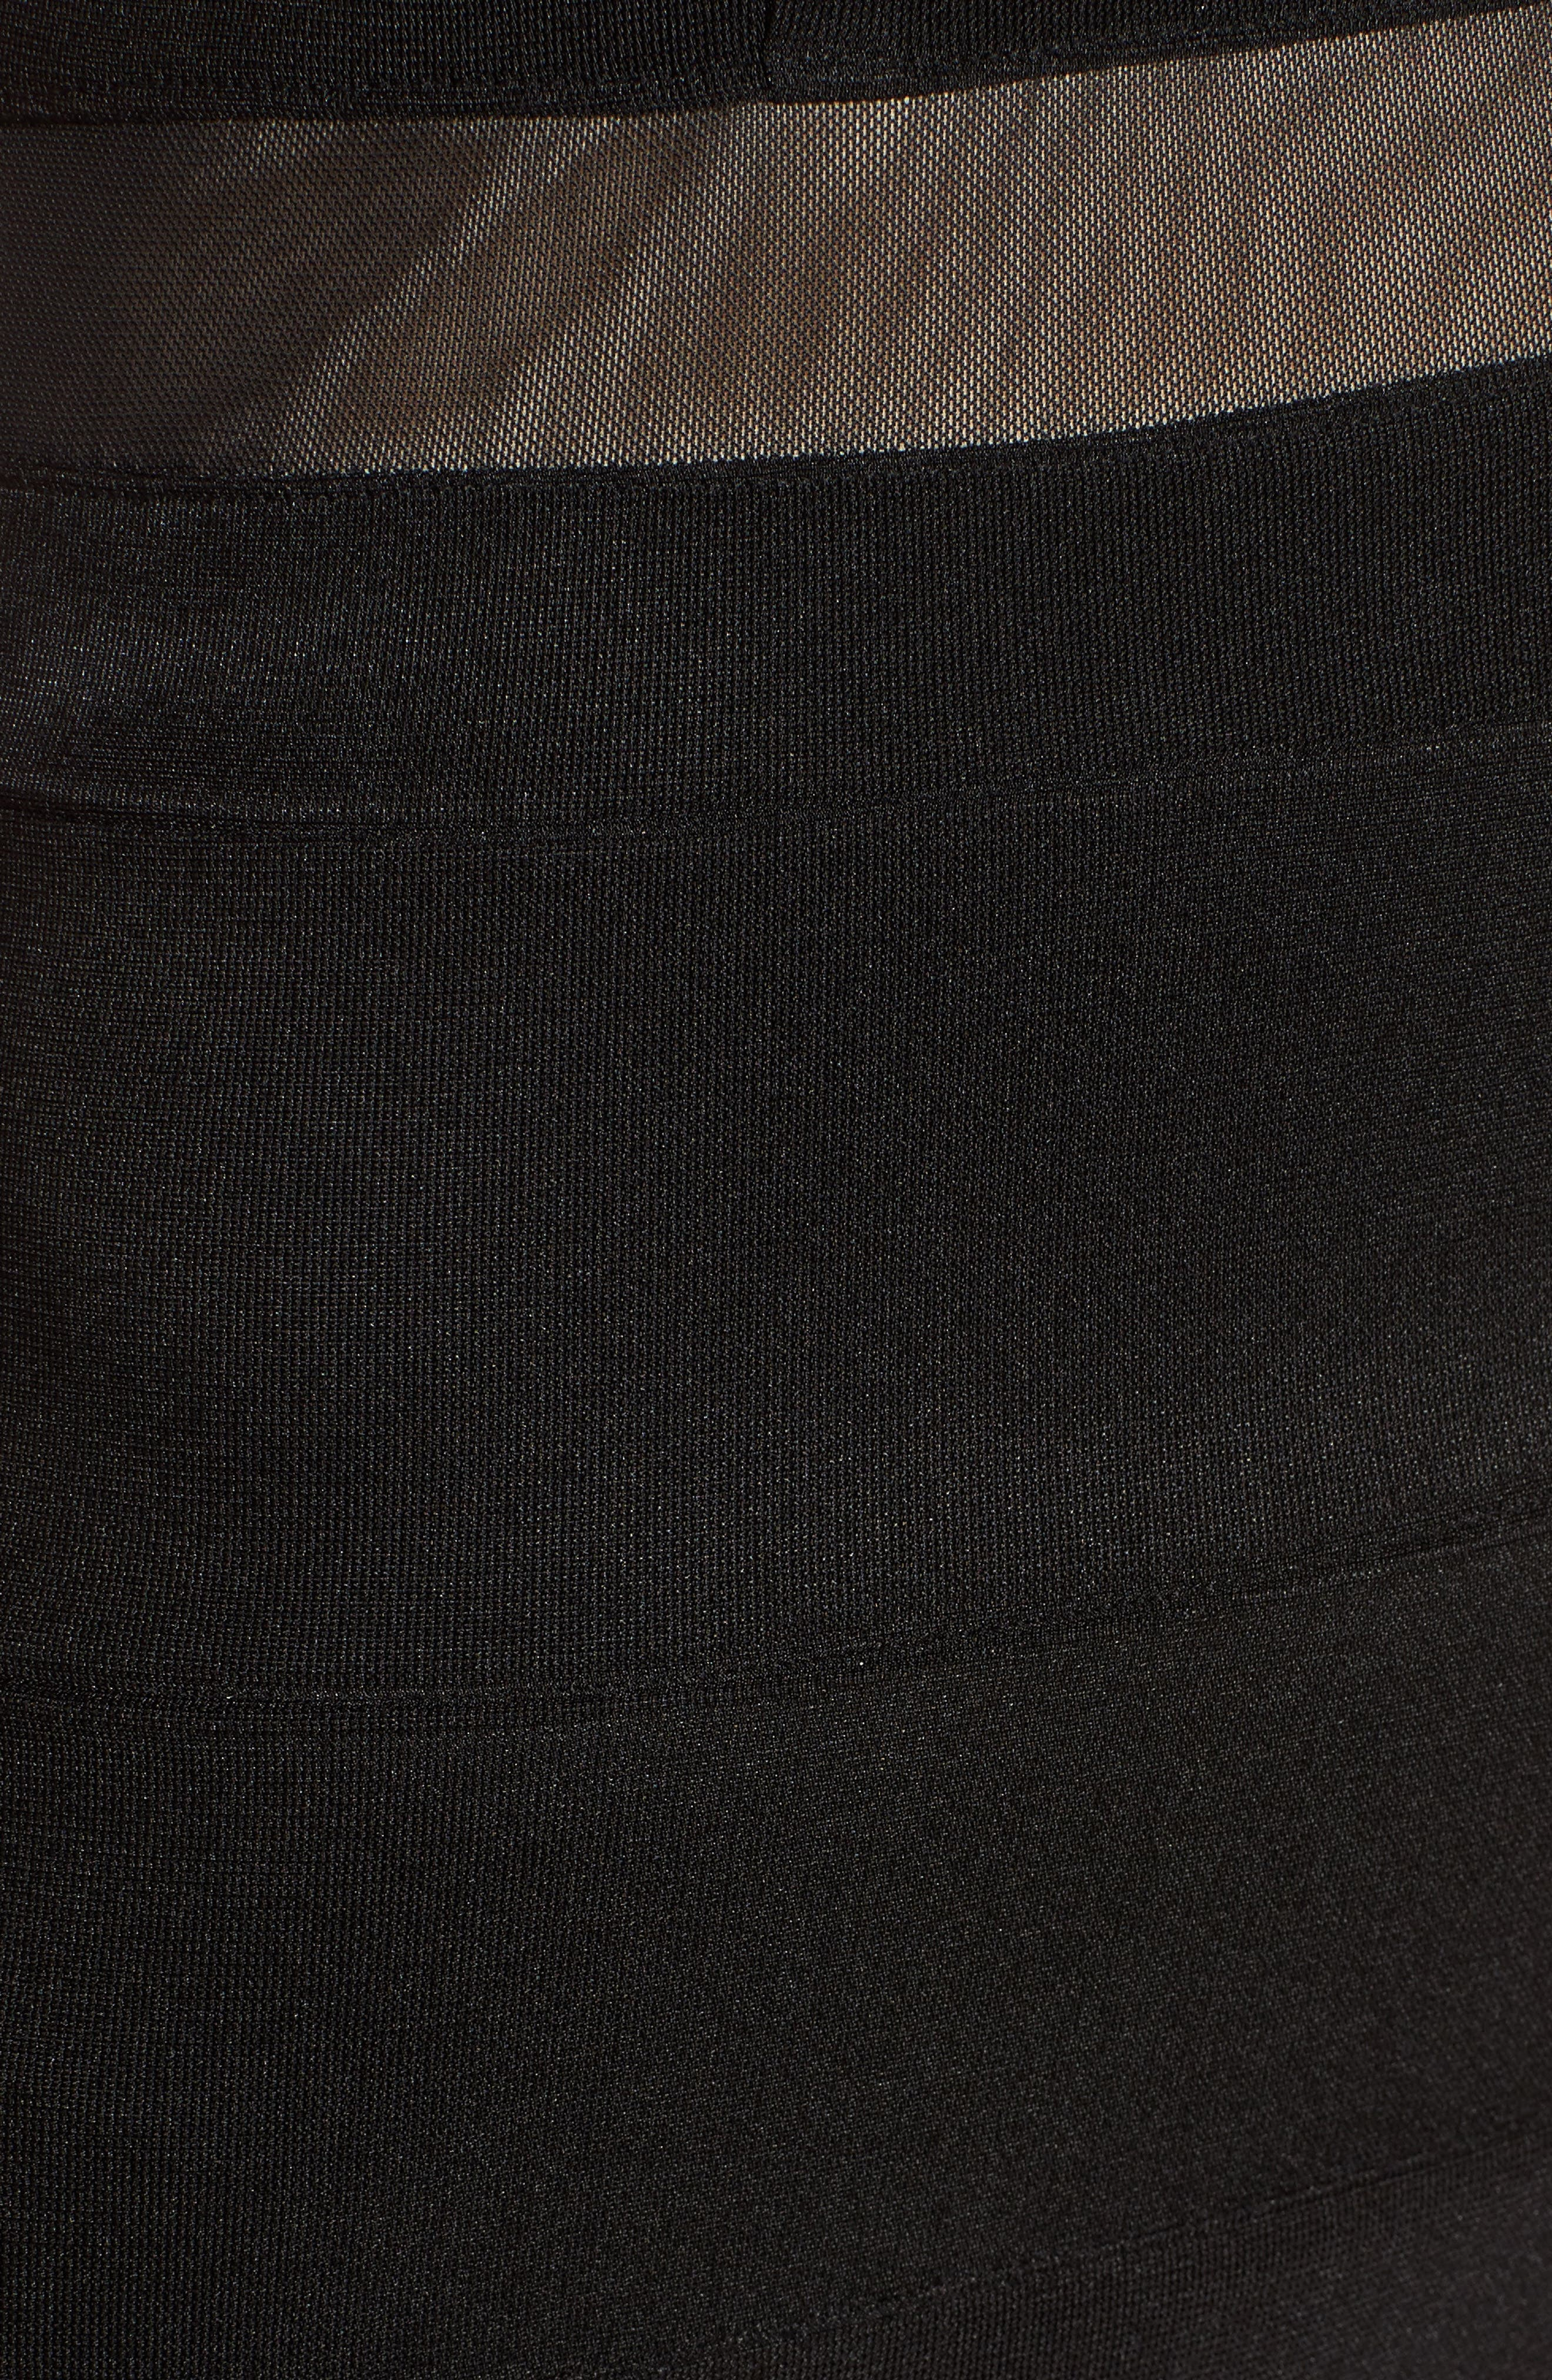 Illusion Body-Con Dress,                             Alternate thumbnail 6, color,                             Black